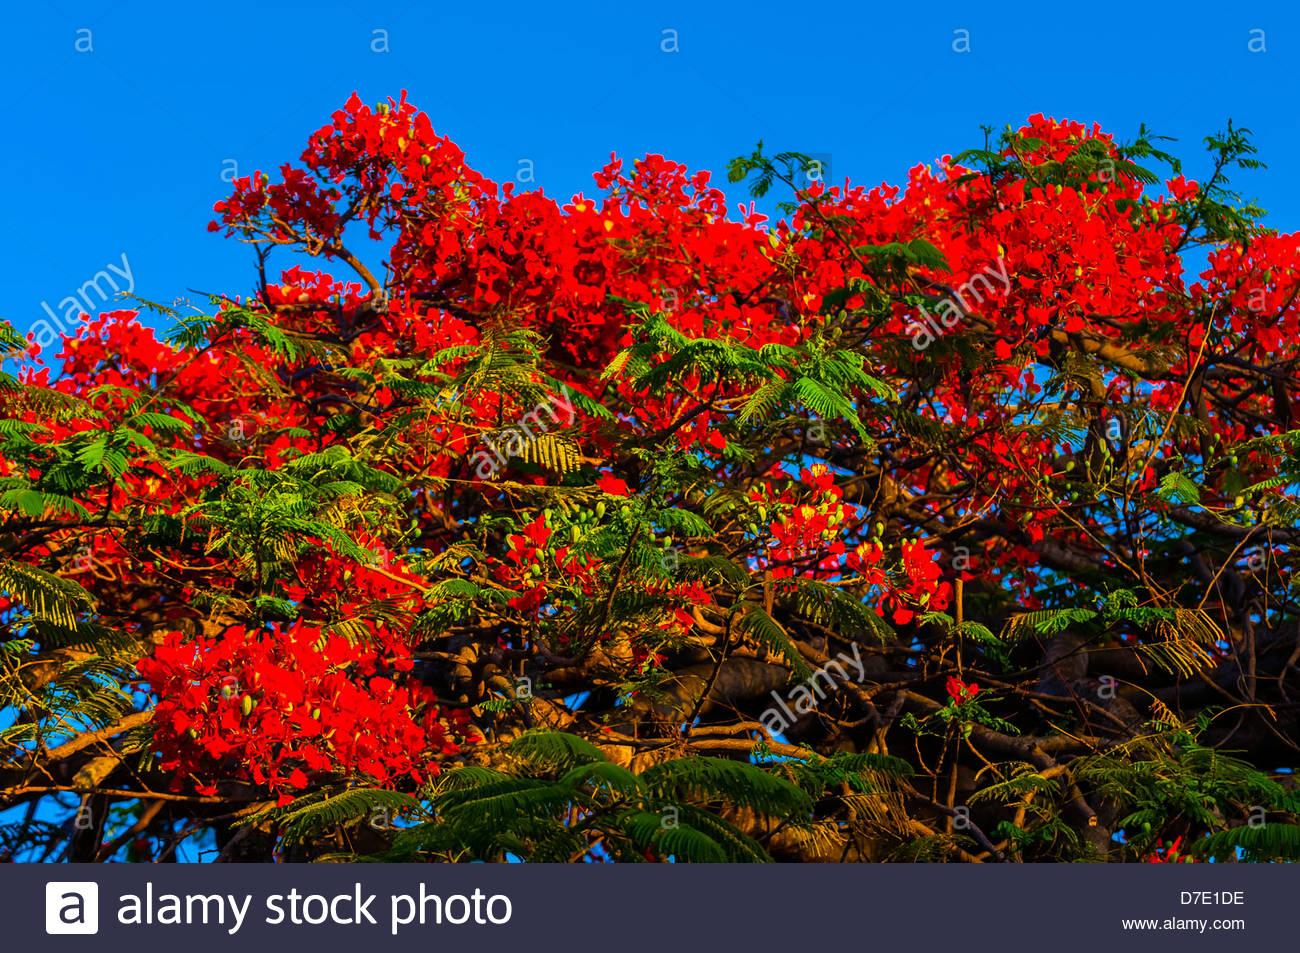 Royal poinciana tree (flame tree), Key West, Florida Keys, Florida USA - Stock Image